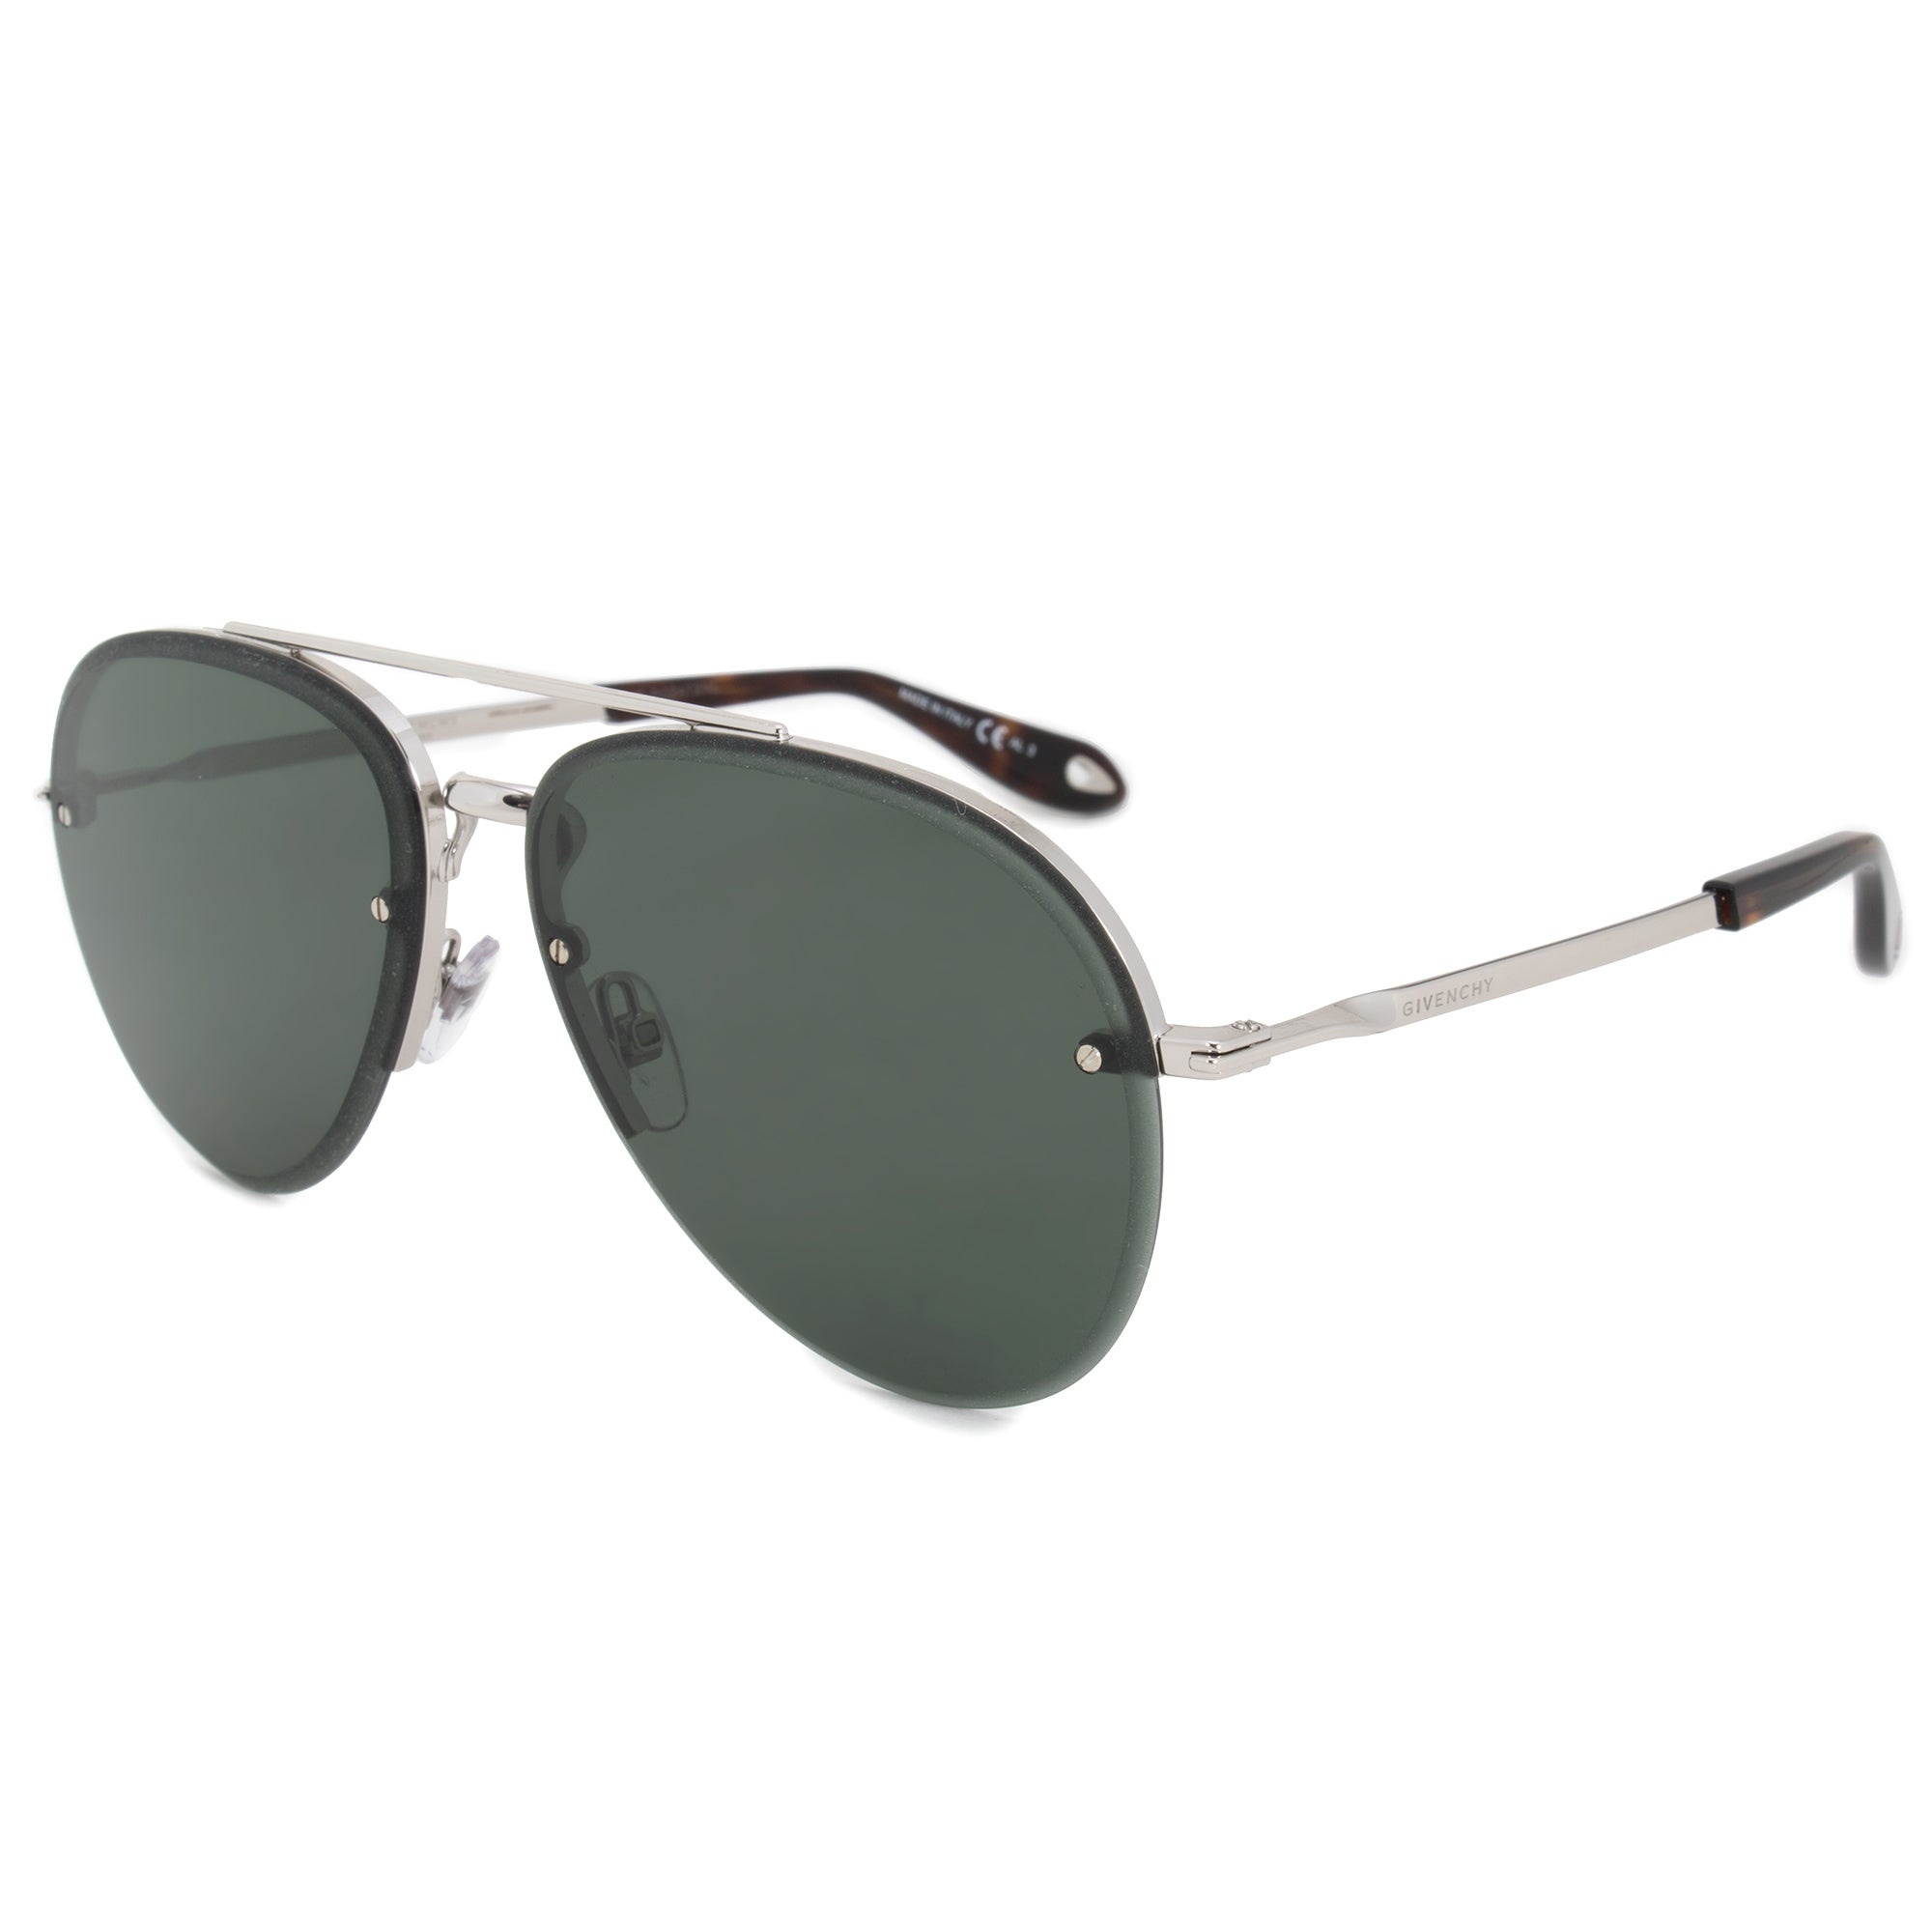 c9e46b58dd Shop Givenchy Aviator Sunglasses GV7075 S 010 QT 62 - Free Shipping Today -  Overstock.com - 21408866